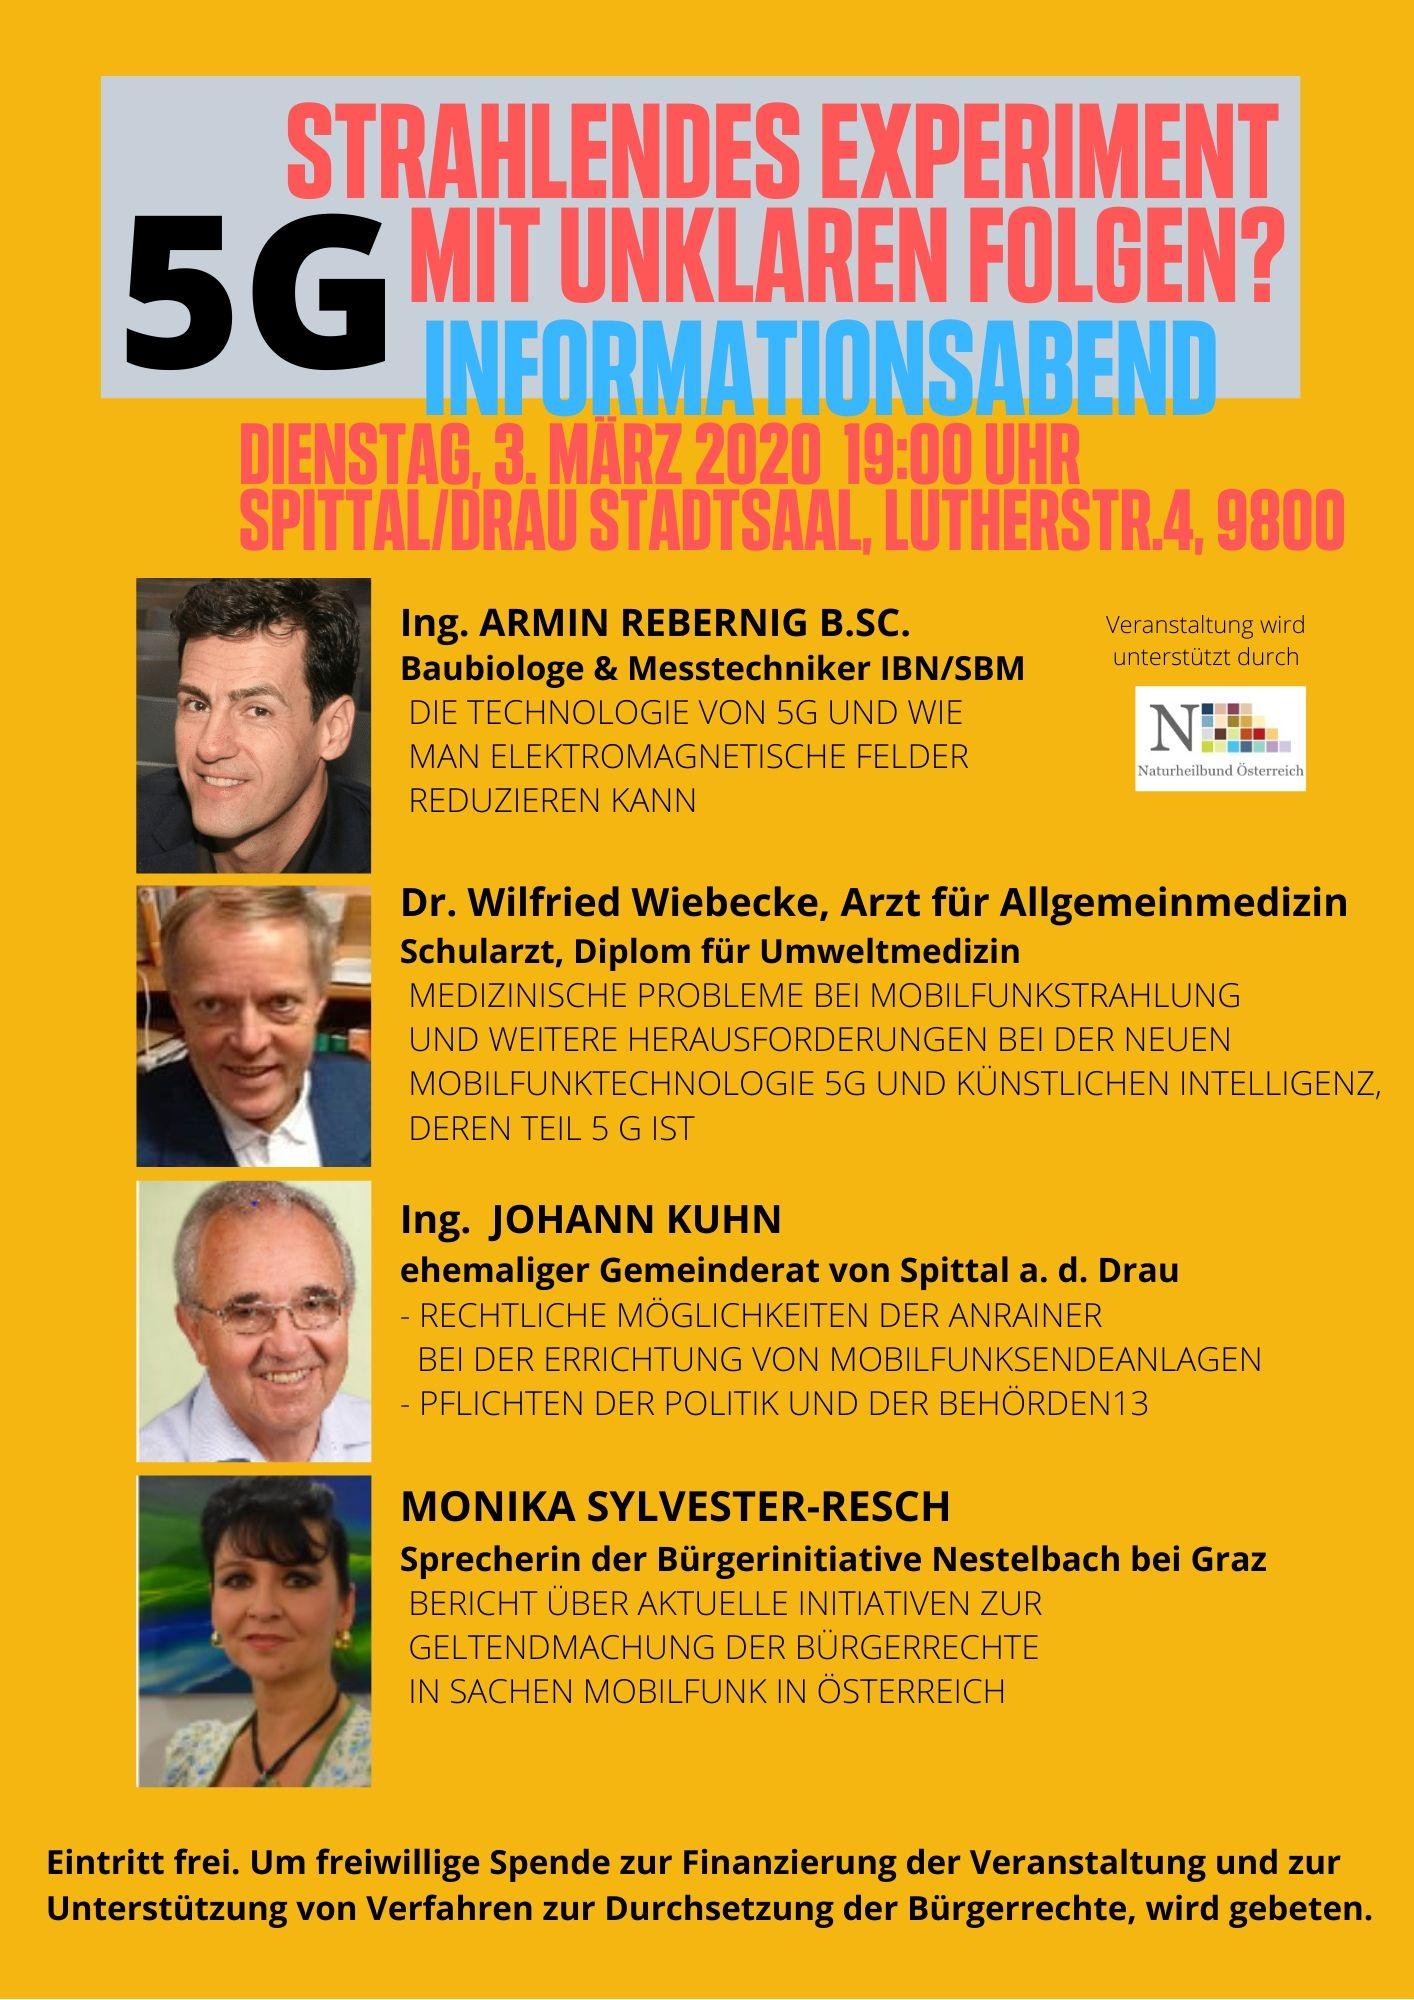 5G_Spittal_JPG.jpg